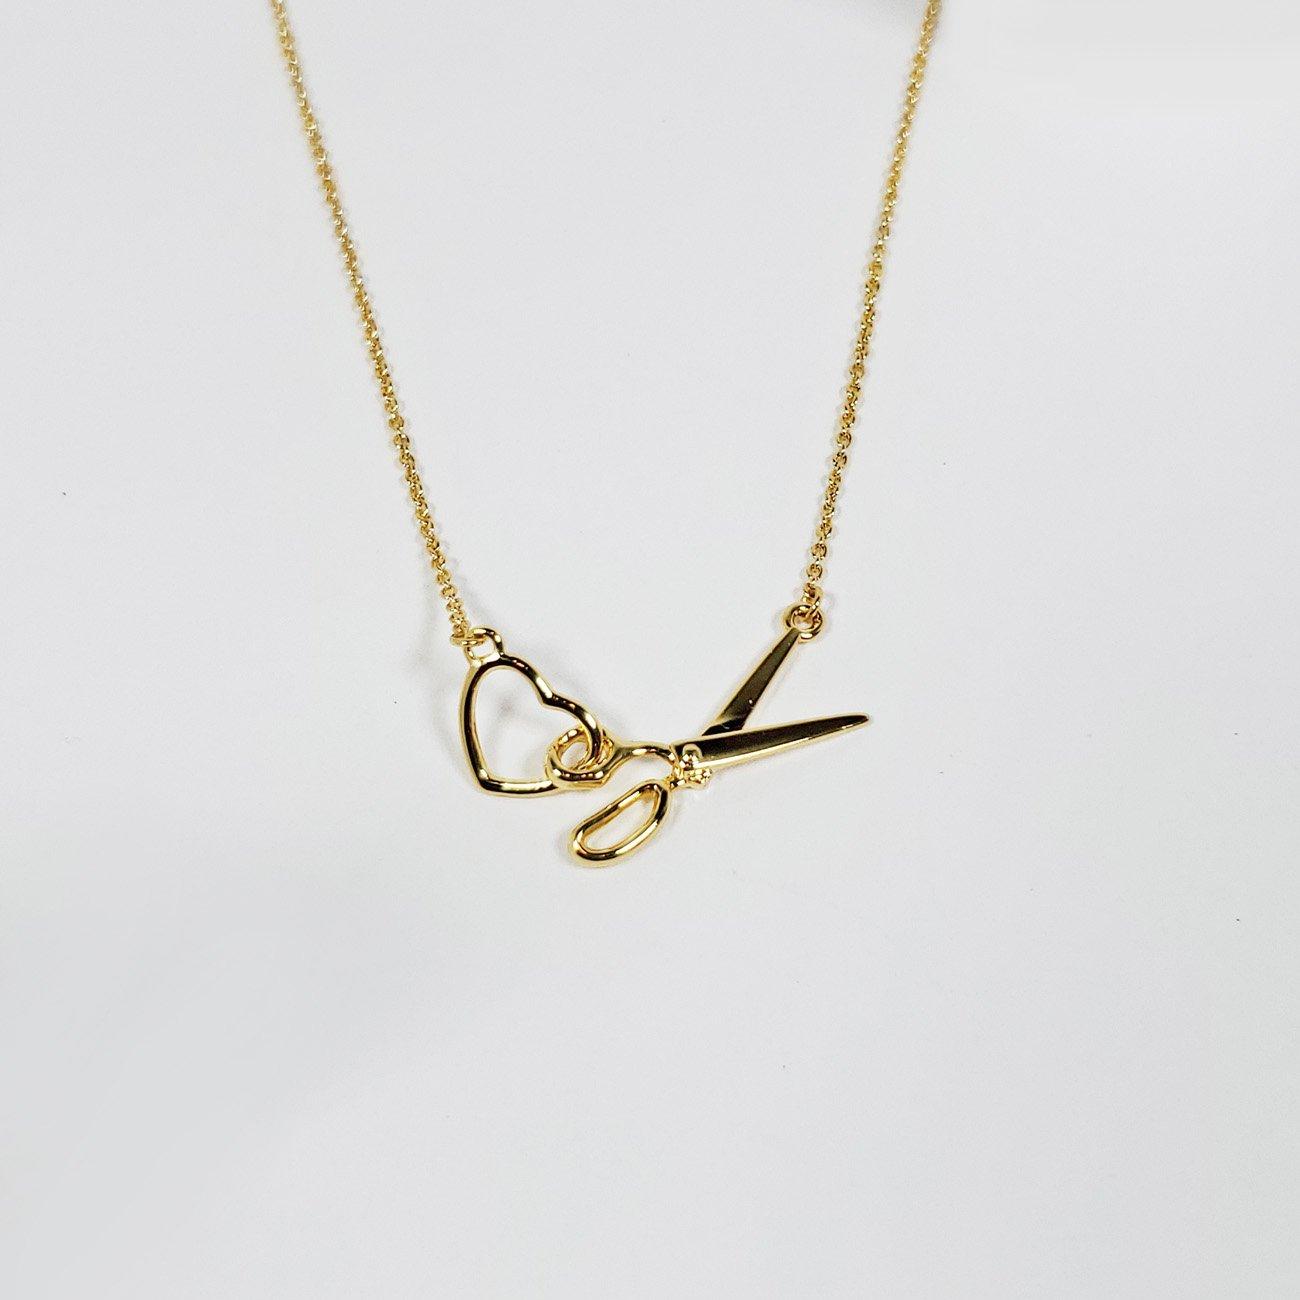 Scissor & Heart Charm Necklace Gold